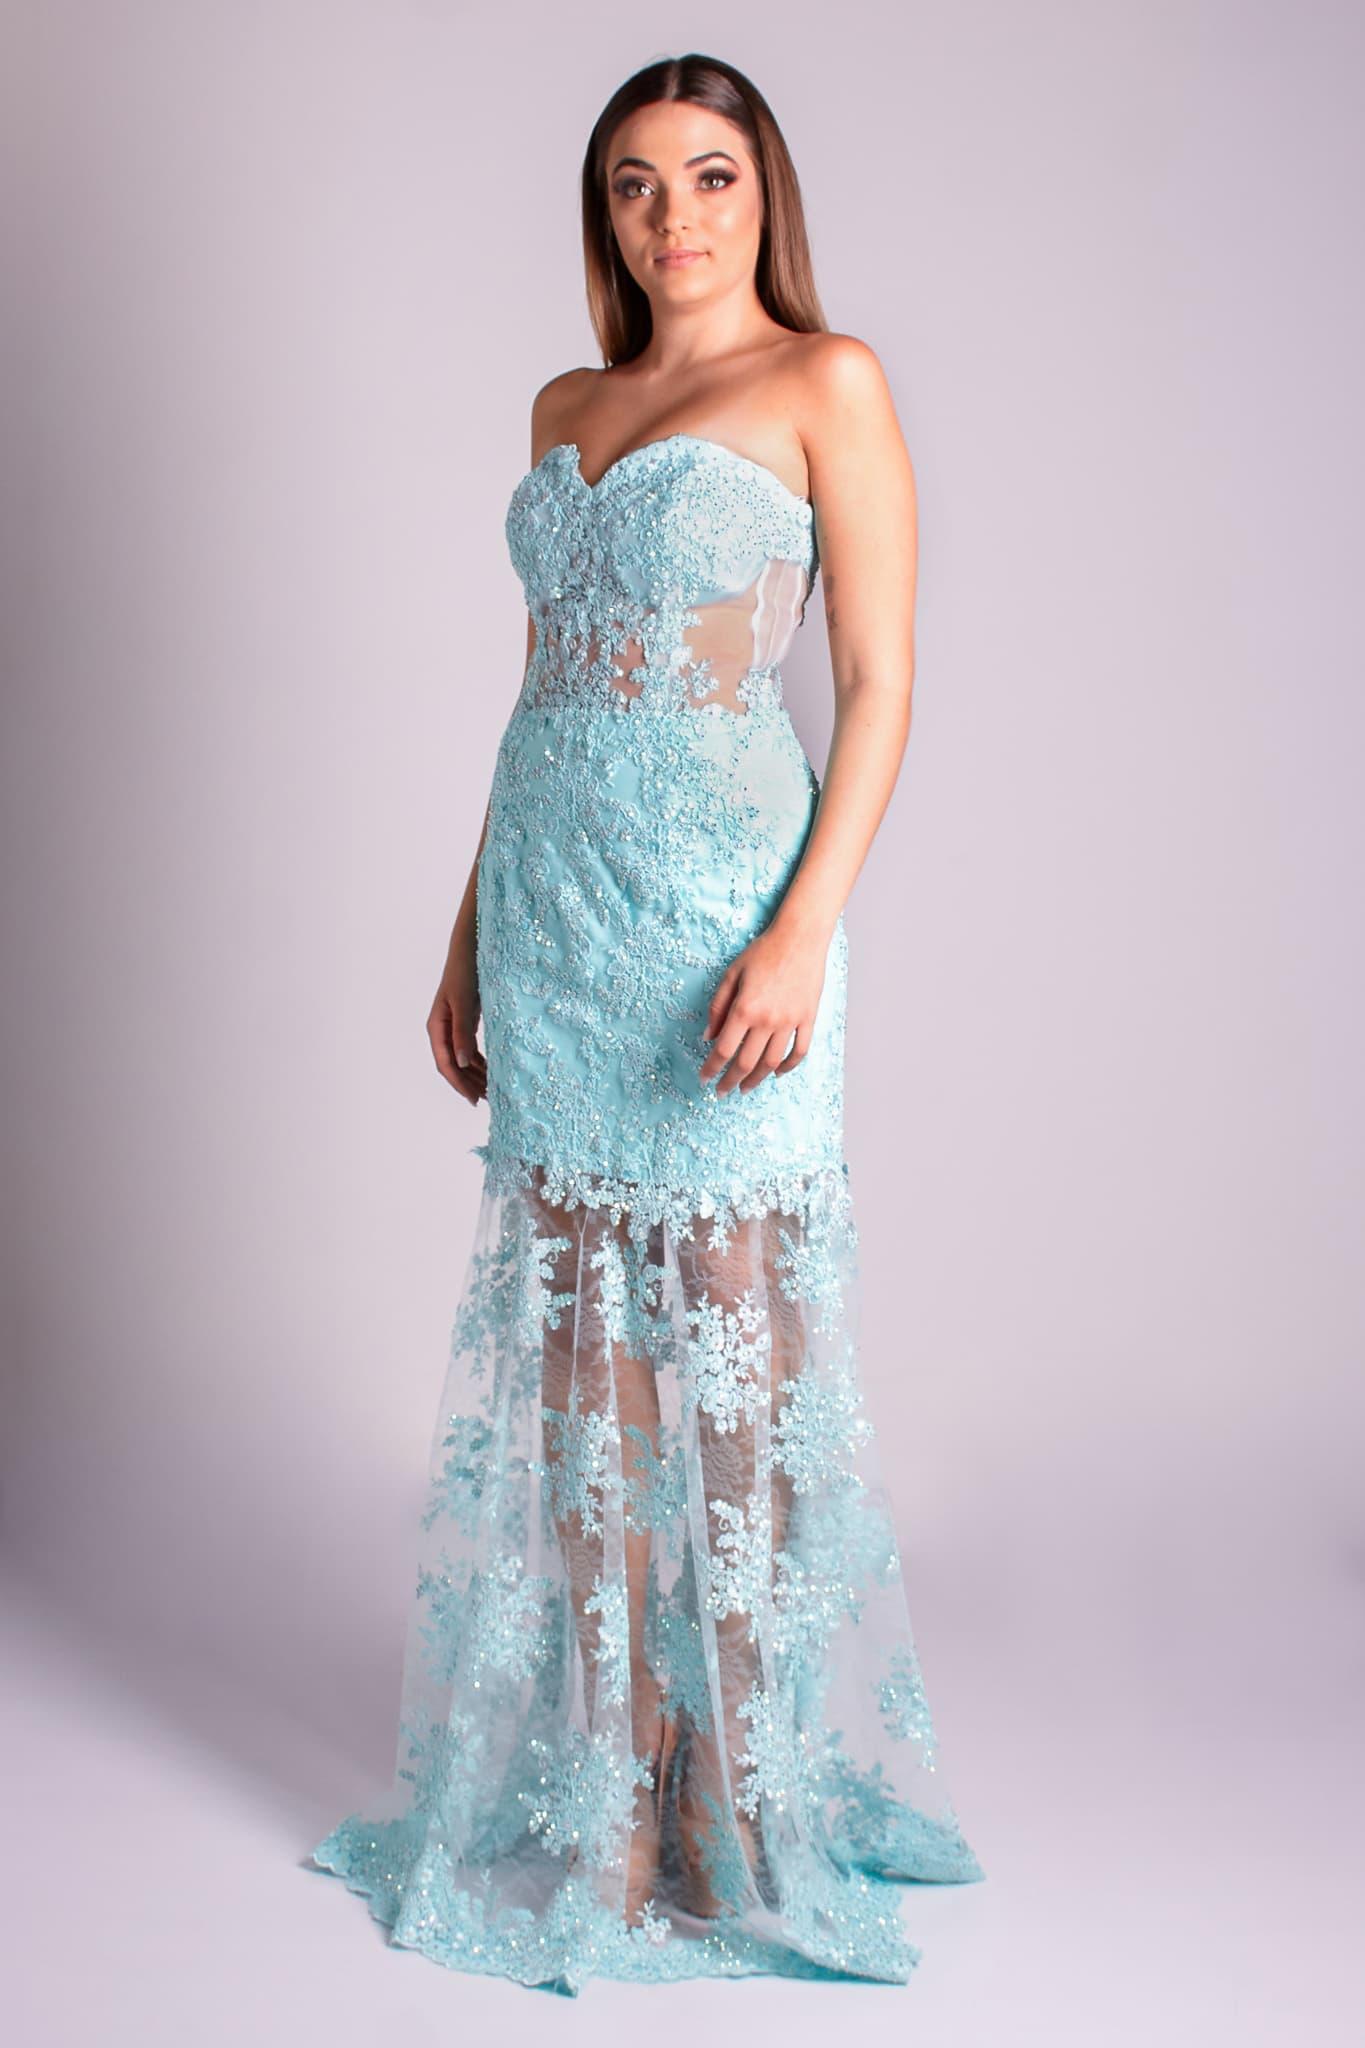 61 - vestido tiffany de renda com tranparência